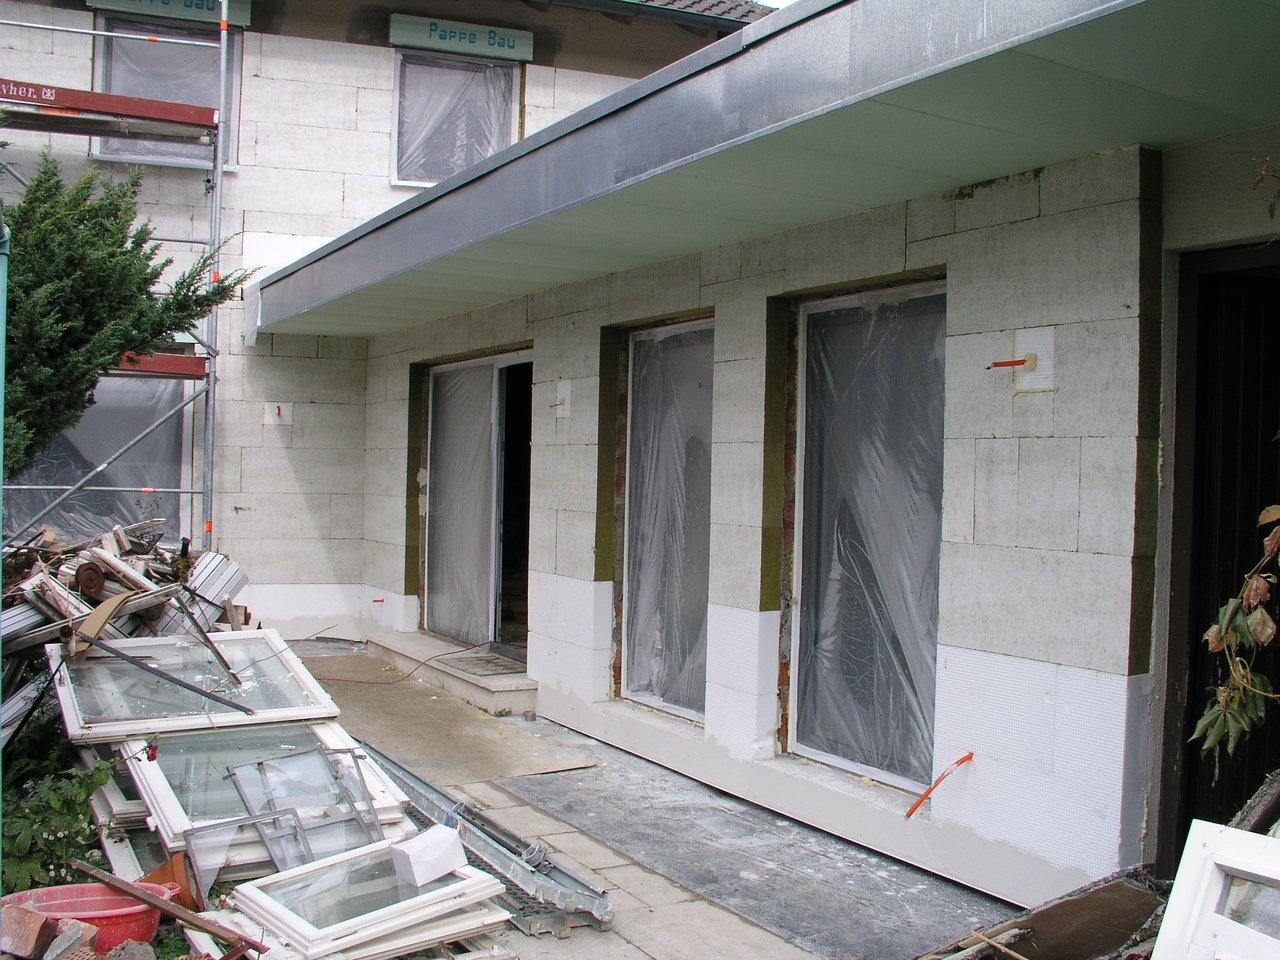 Wdvs - Uwe Pappe Stuckateurbetrieb